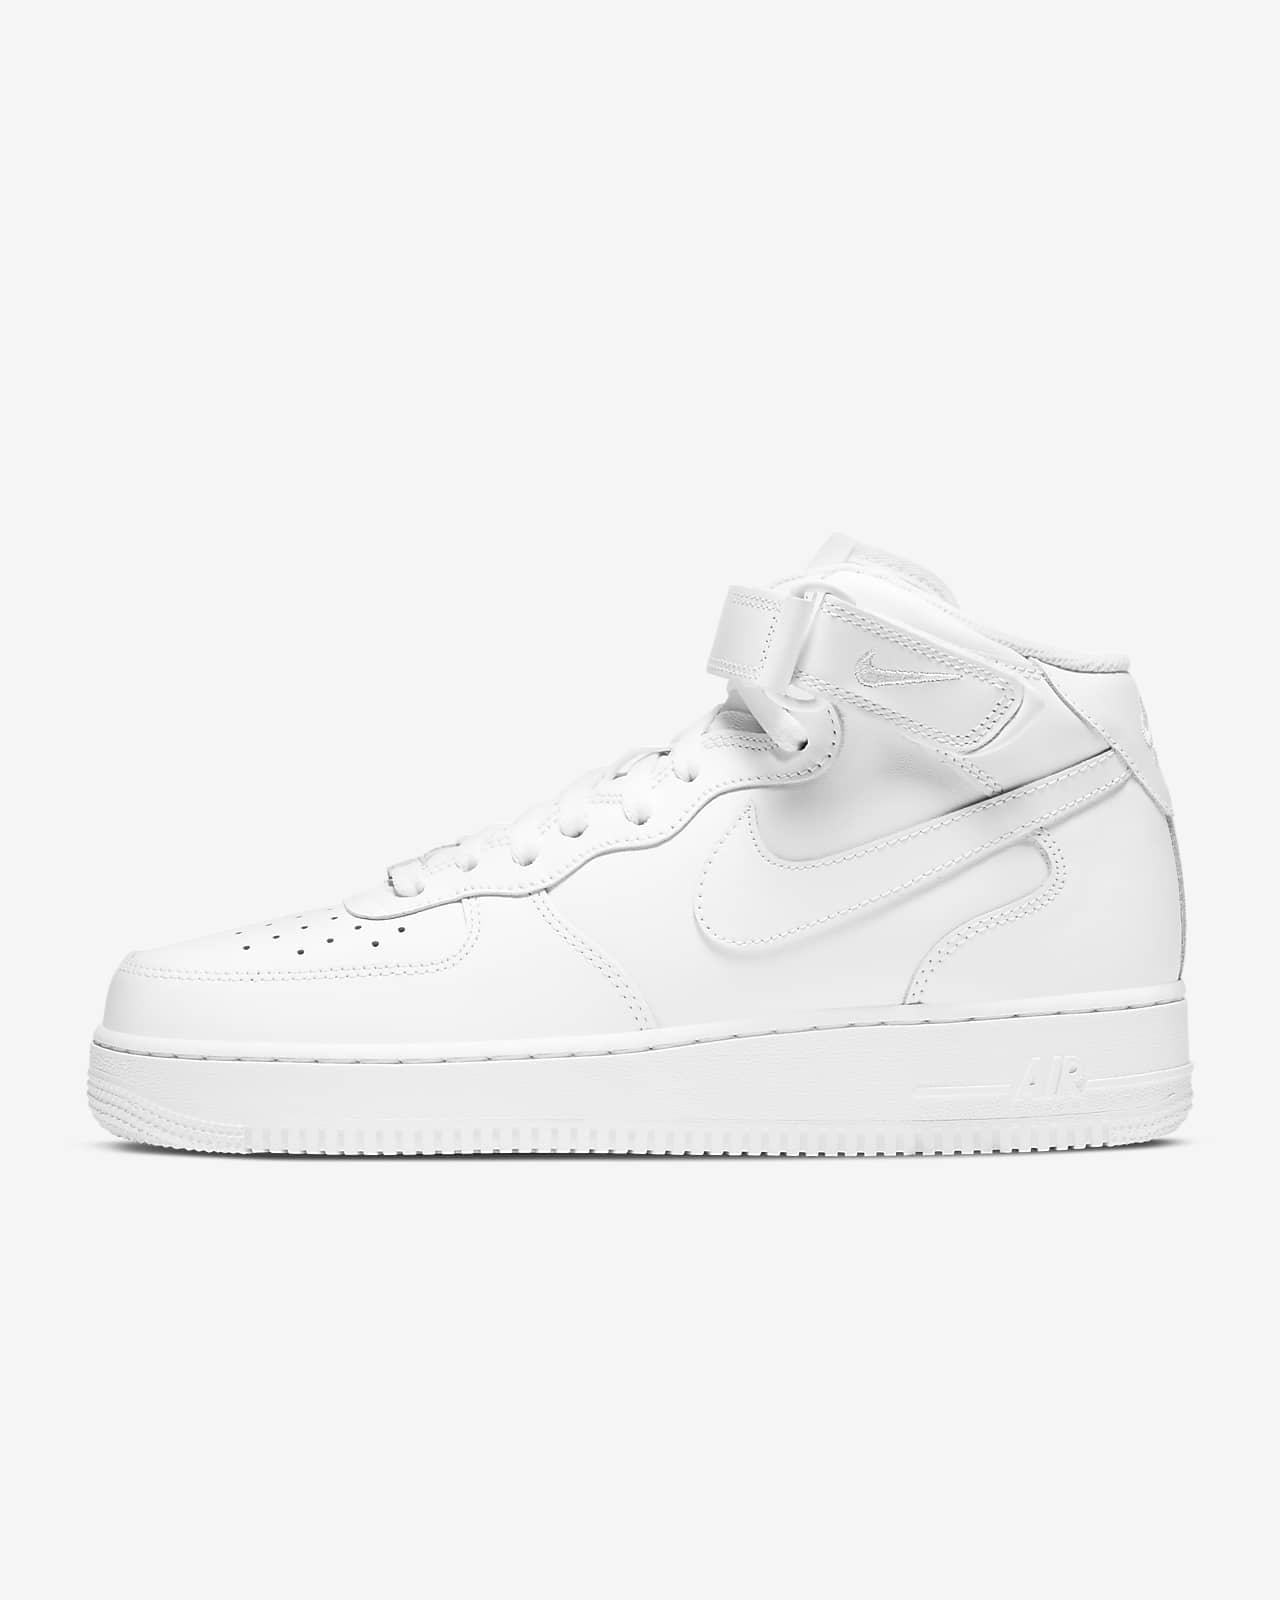 Nike Air Force 1 Mid '07 Men's Shoe. Nike LU